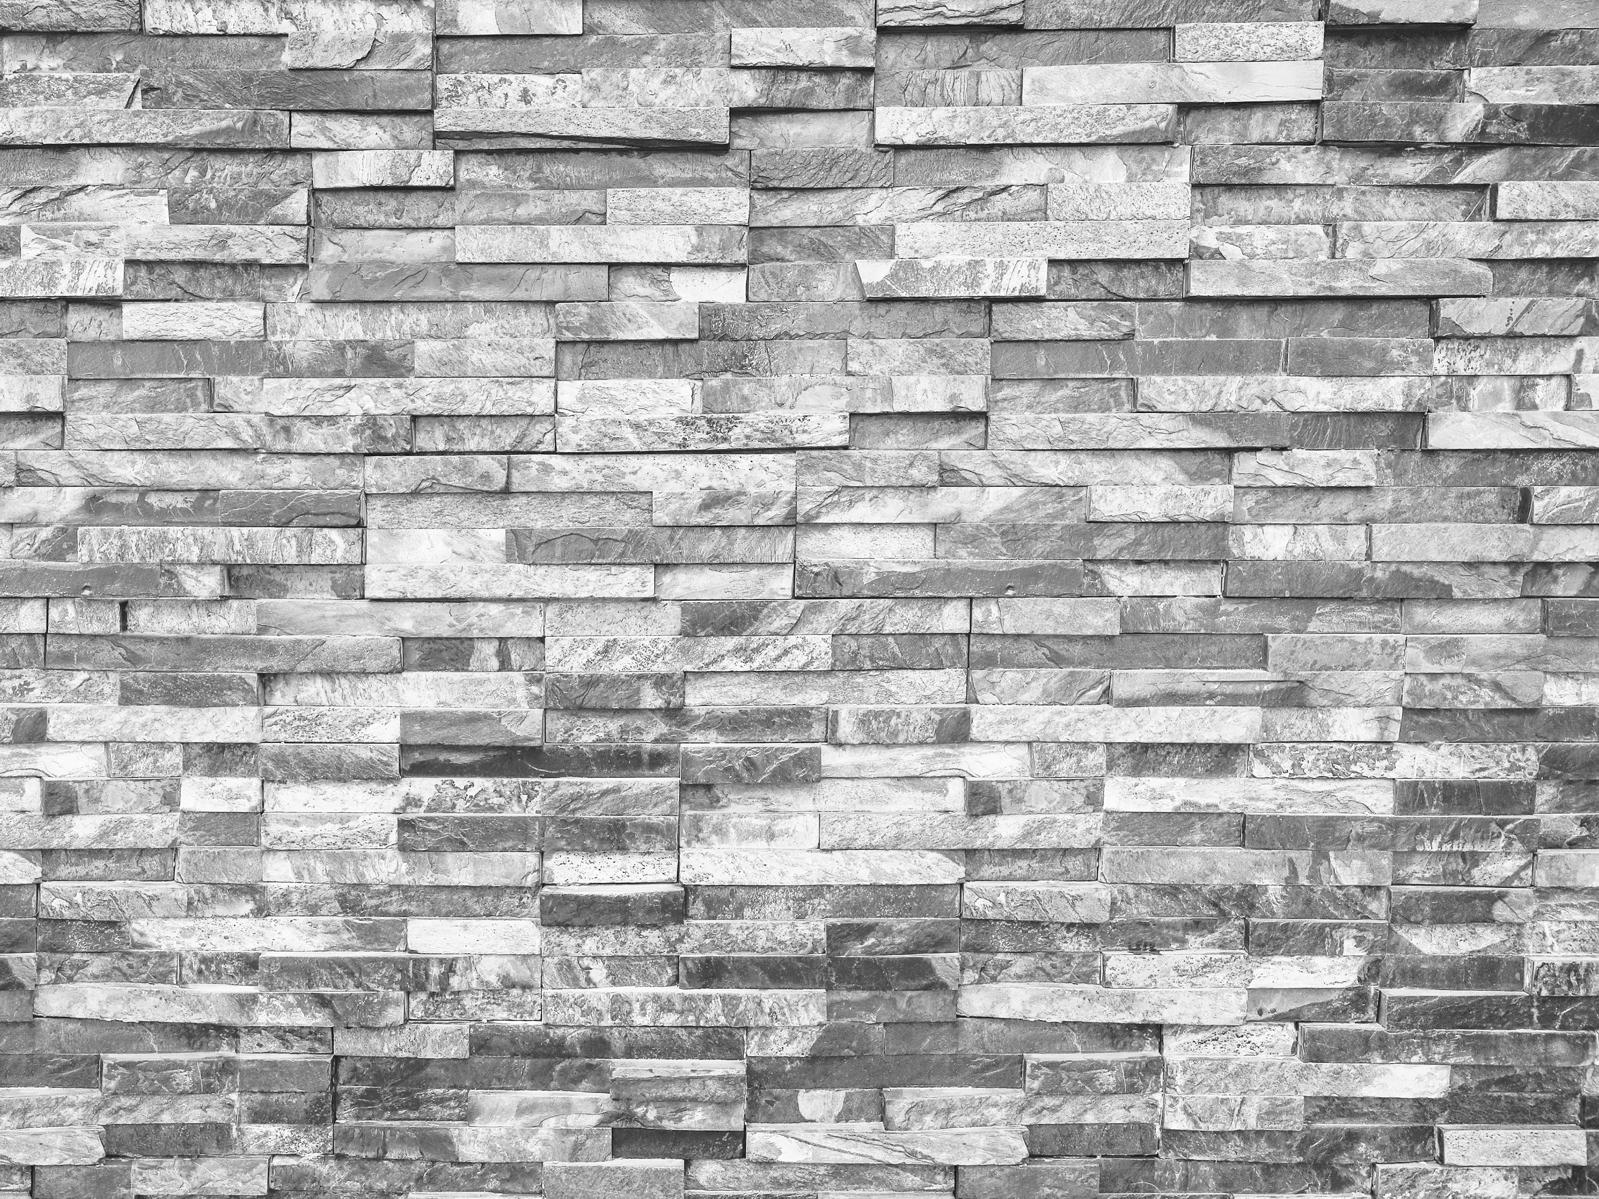 Full Size of Fototapete Grau Vlies Tapete Mauer Steinoptik Steinwand Weiss Landhausküche Sofa Leder Chesterfield Regal Weiß Graues Xxl Wohnzimmer Schlafzimmer Wohnzimmer Fototapete Grau